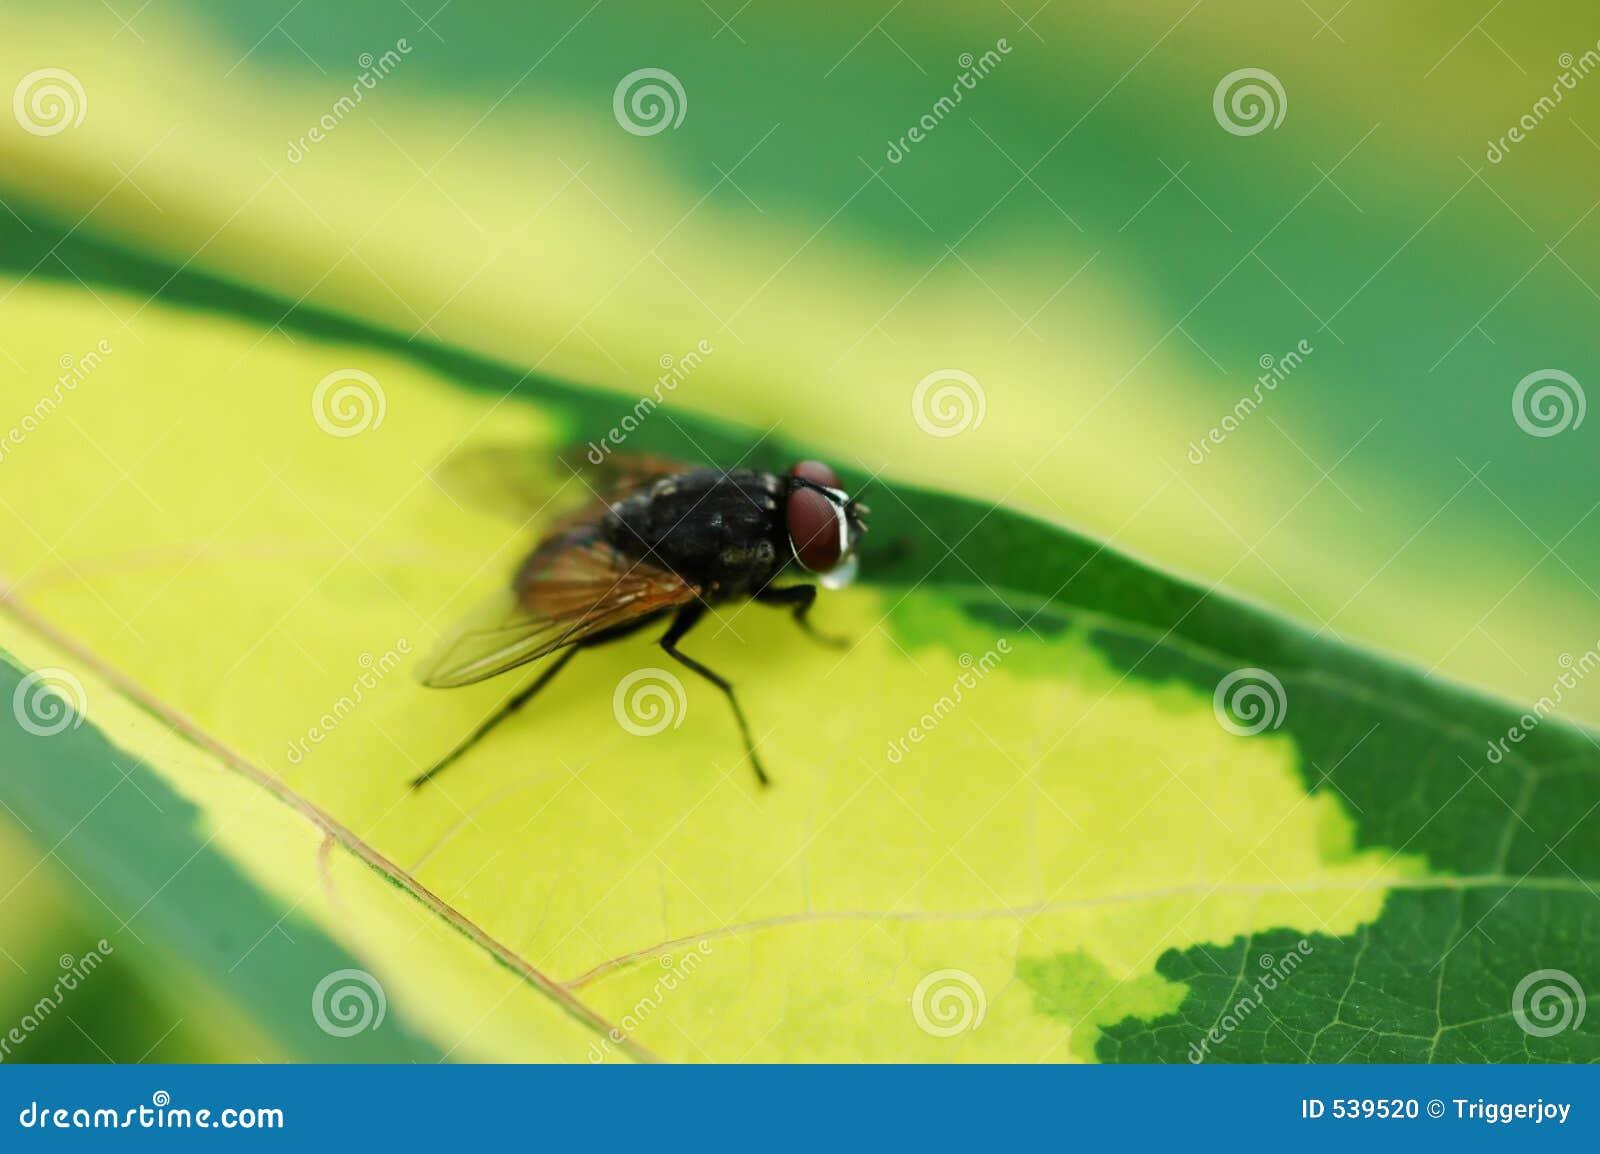 Download 飞行房子 库存照片. 图片 包括有 叶子, 宏指令, 绿色, 滤网, 昆虫, 飞行, 关闭, 房子, 本质, 栖息 - 539520